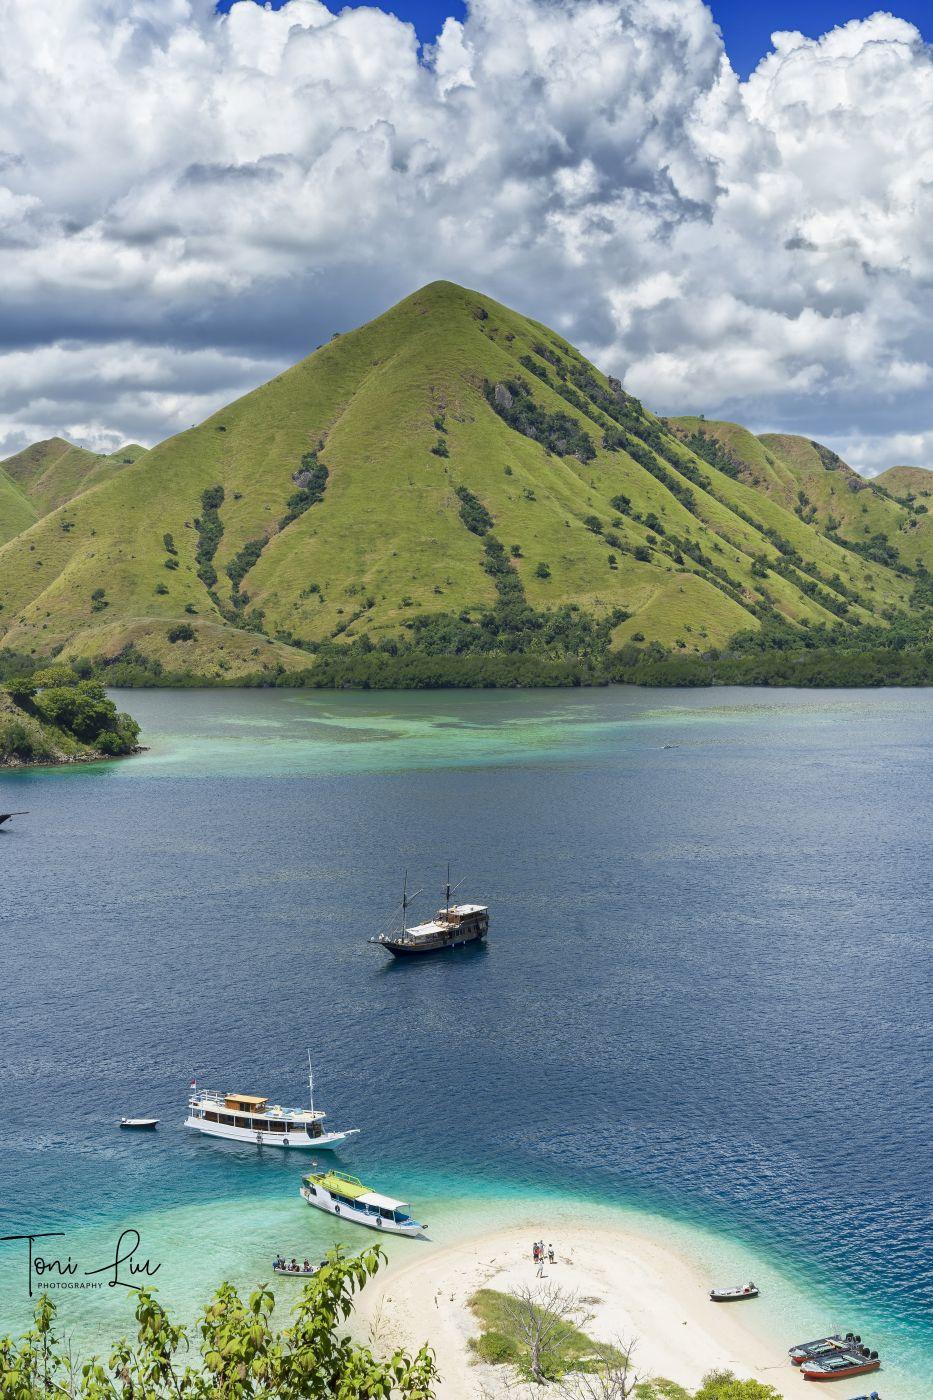 Kelor Island with Tugas Island View, Indonesia